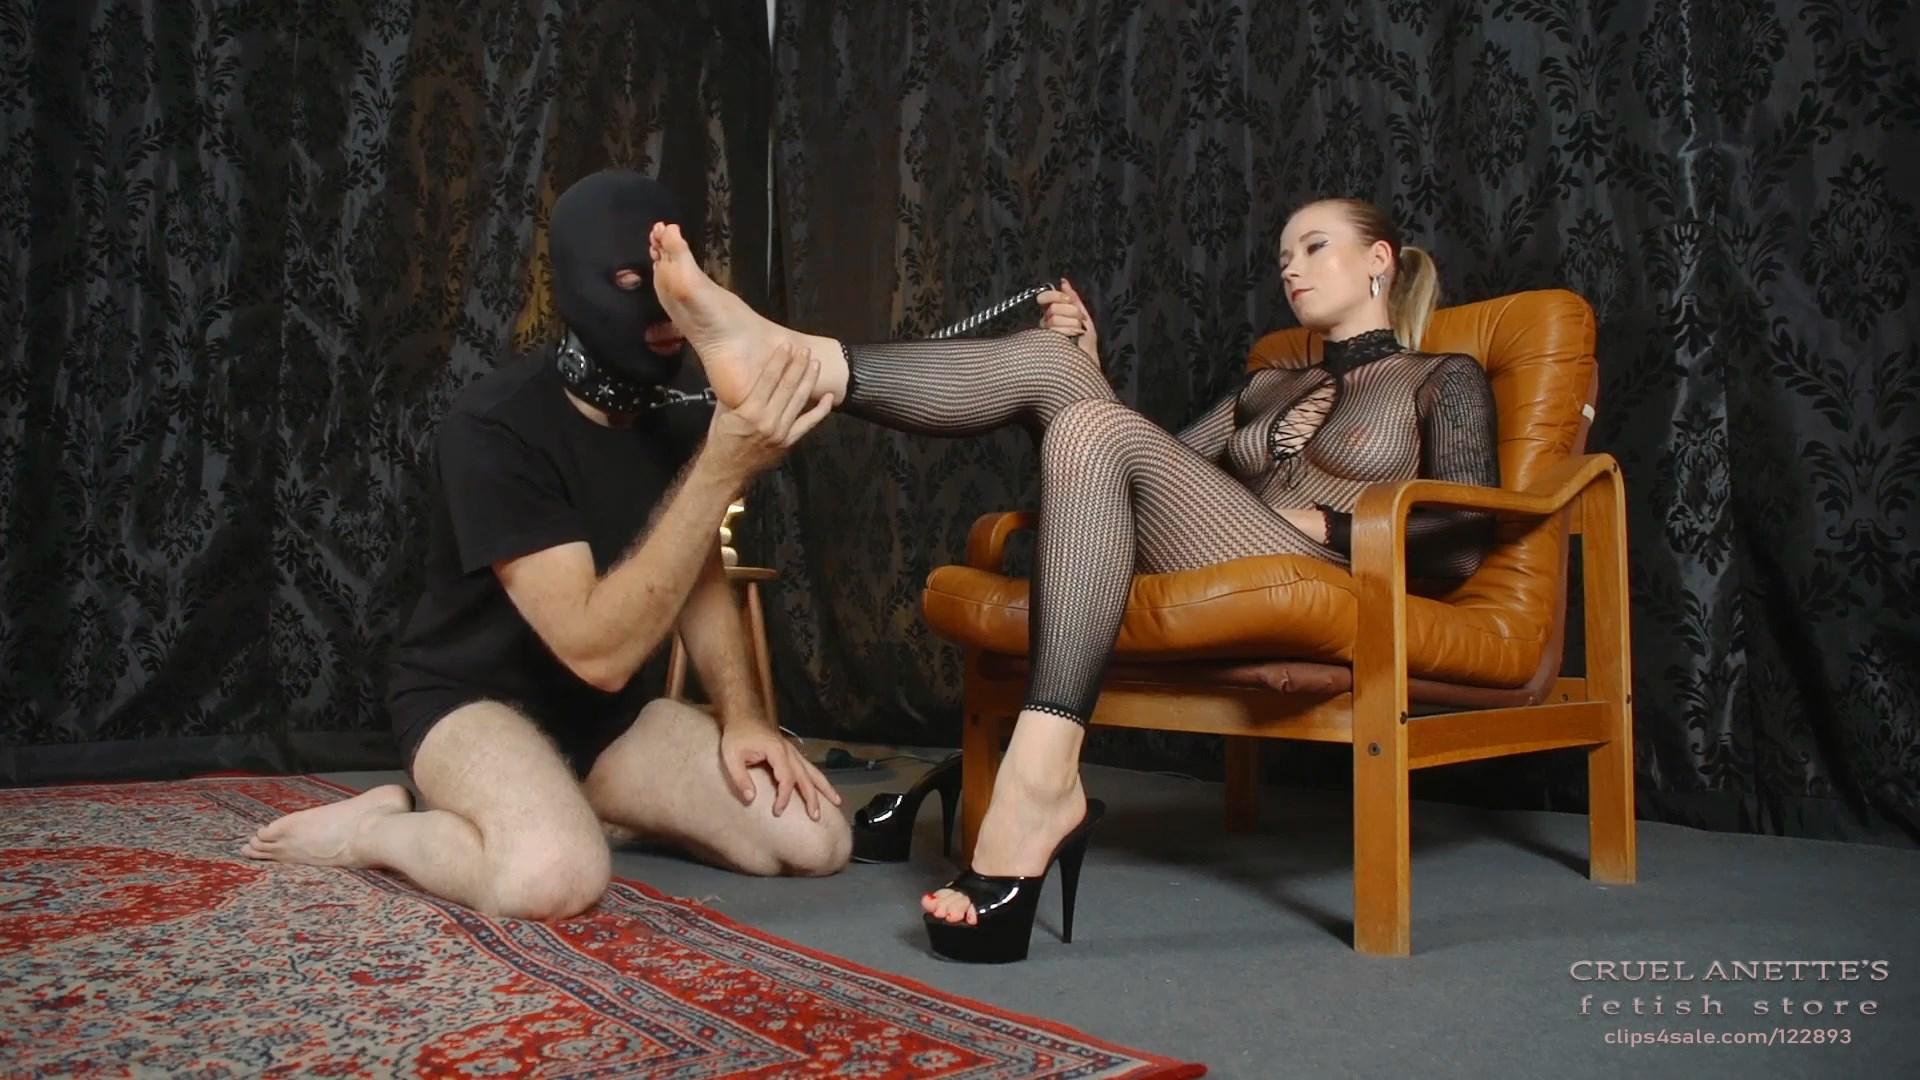 Feet licking on leash - CRUEL ANETTES FETISH STORE - FULL HD/1080p/MP4